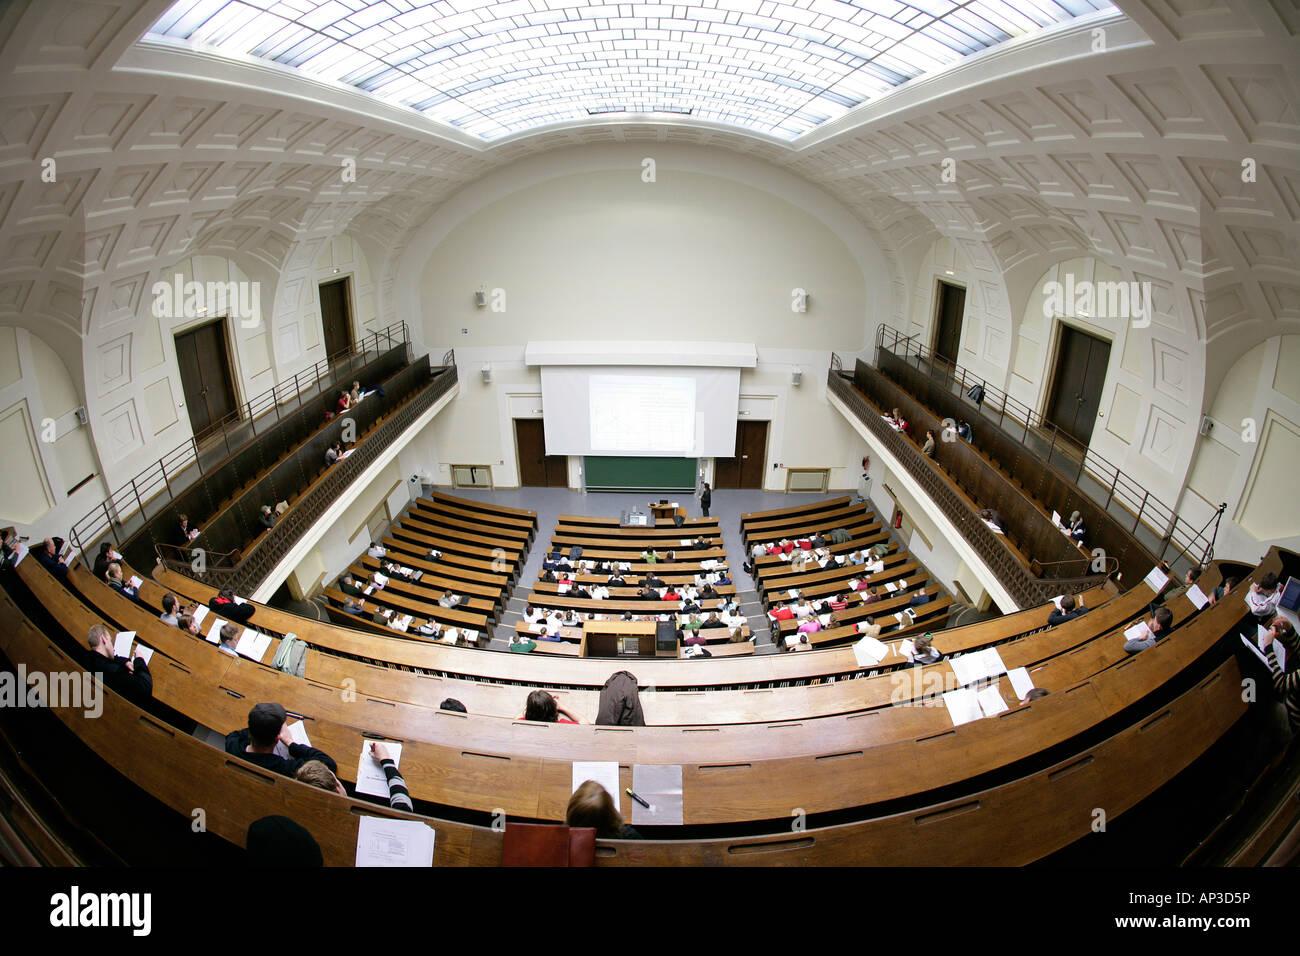 Lecture in the auditorium Maximum, LMU, University, Ludwig Maximilians Universitaet, Munich, Bavaria, Germany - Stock Image